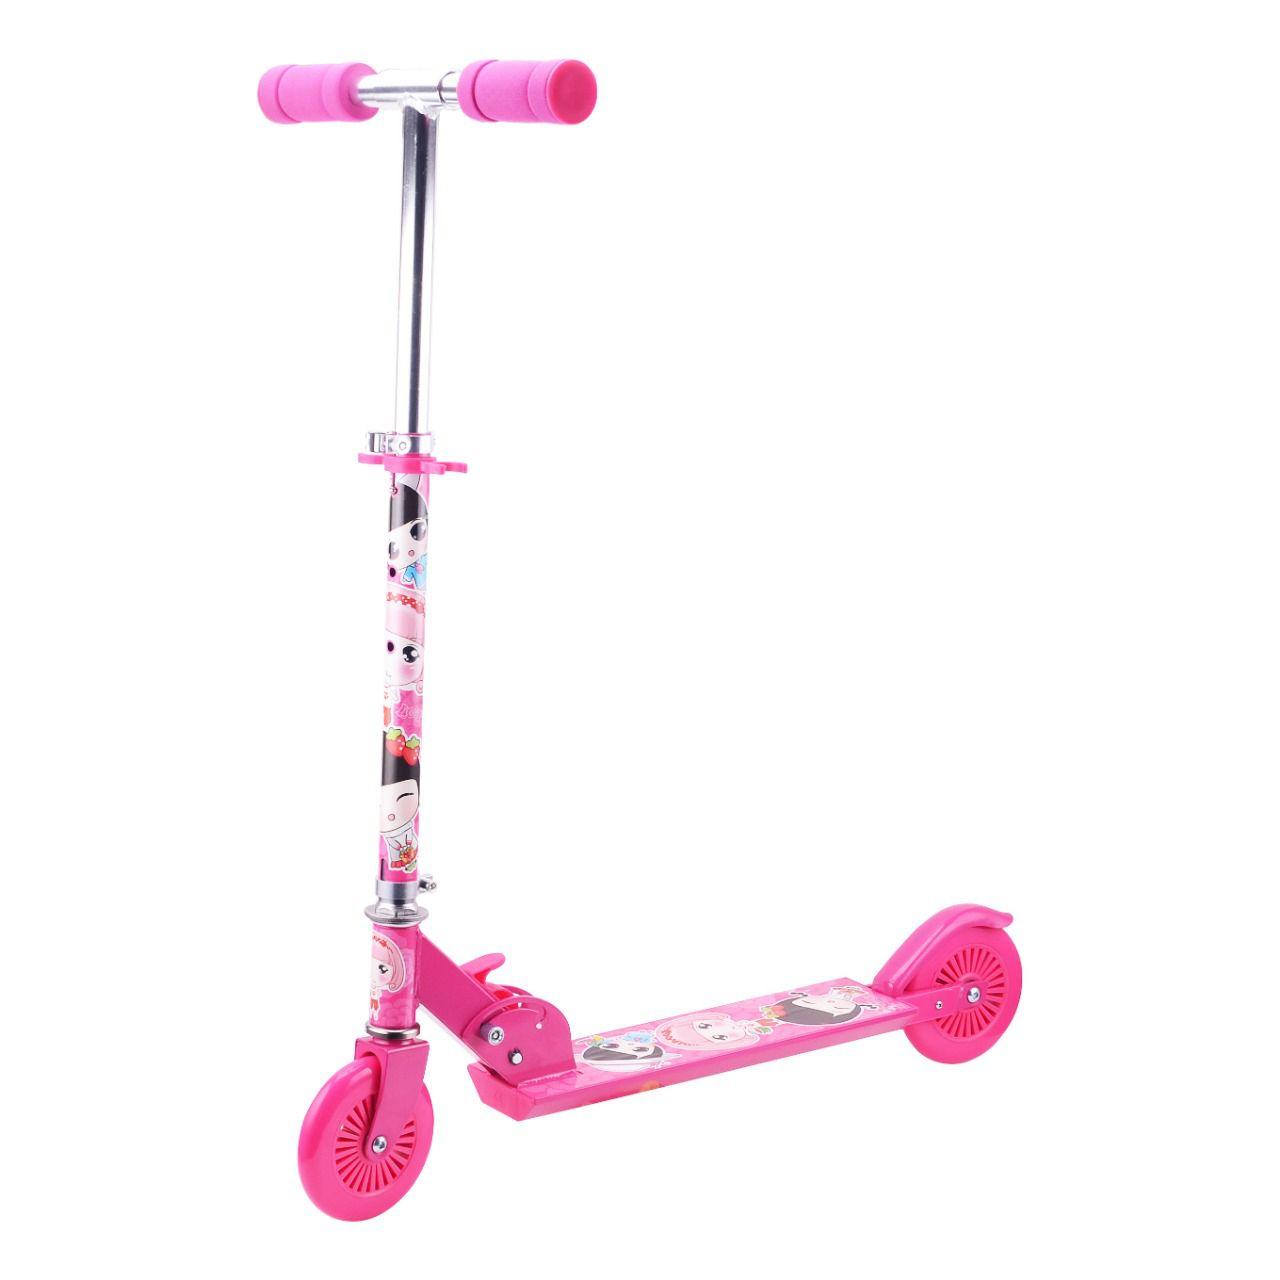 Patinete Infantil Para Meninas Rosa Com LED 2 Rodas - YTA-13RO-LX